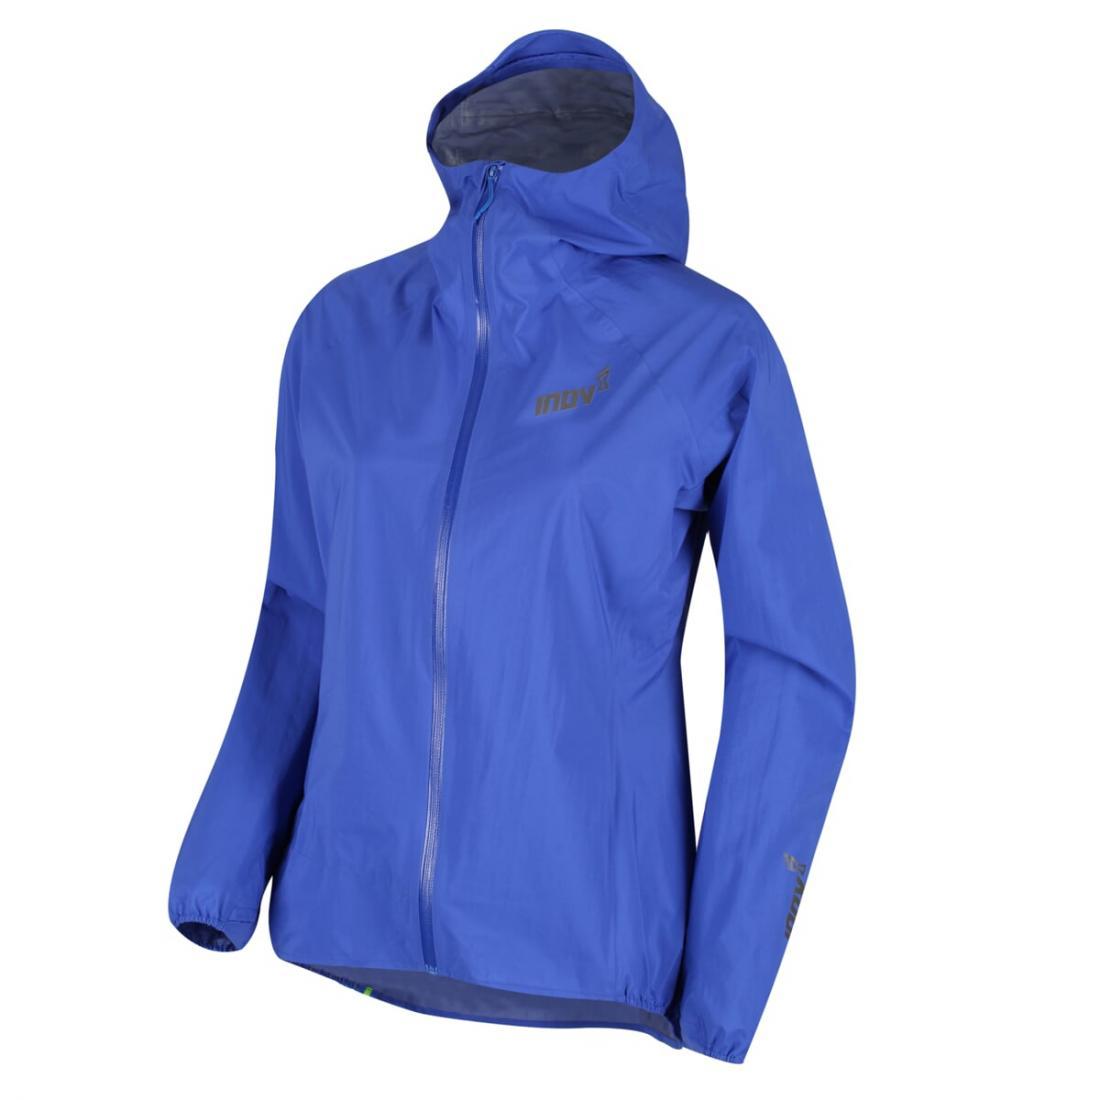 Куртка AT/C STORMSHELL FZ W Inov-8 синего цвета